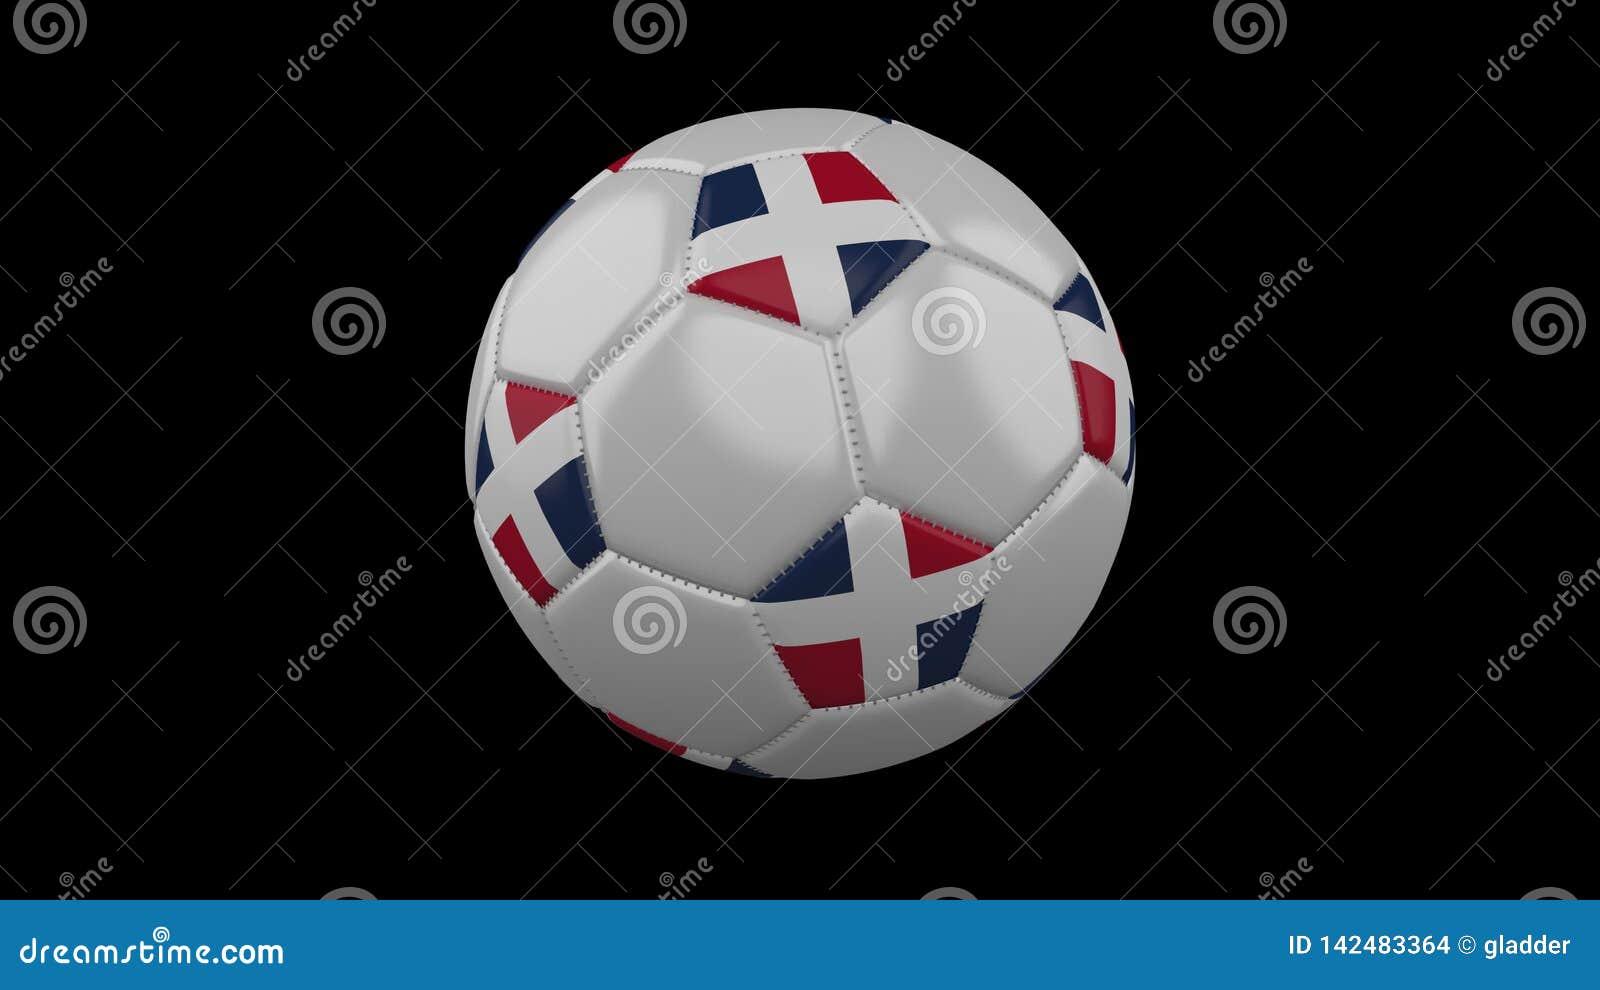 Ballon de football avec le drapeau dominicain, rendu 3d